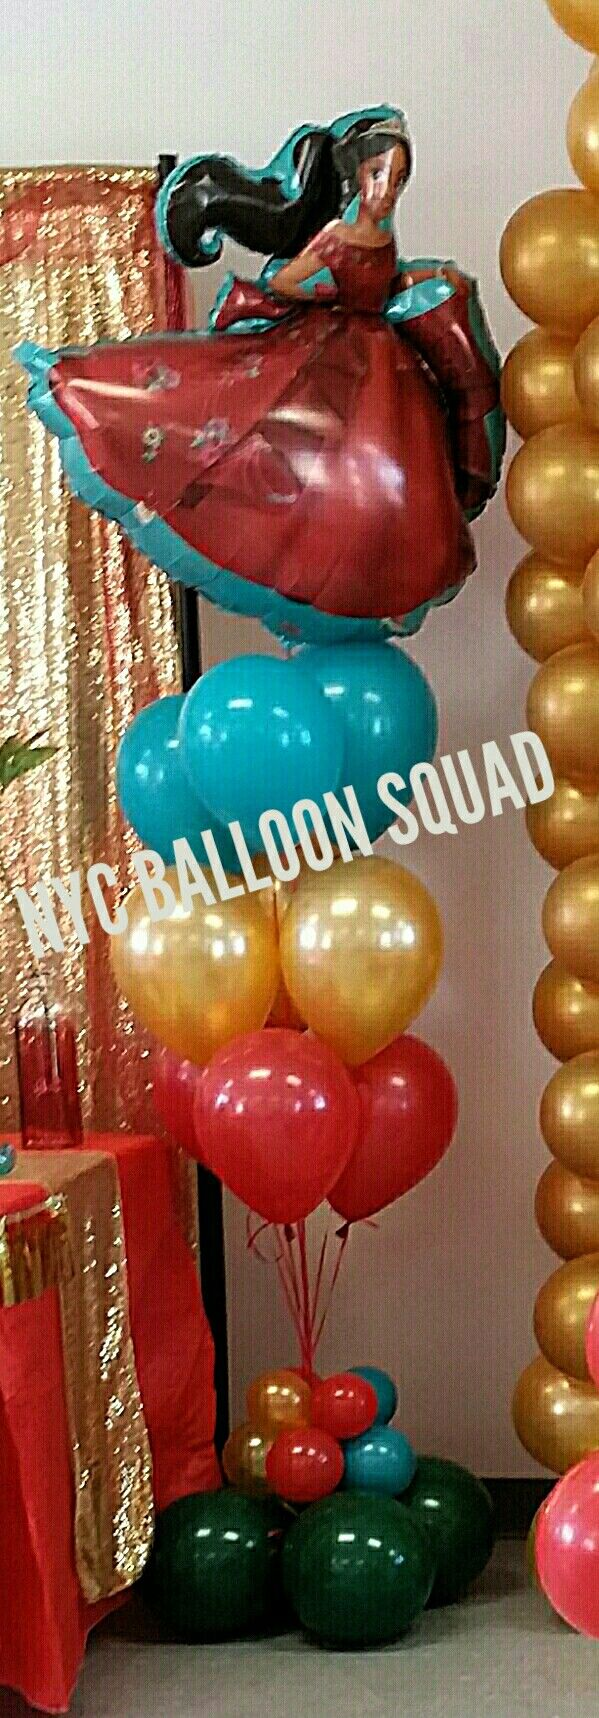 Disney Princess Elena of Avalor balloon bouquet centerpiece / floor bouquet